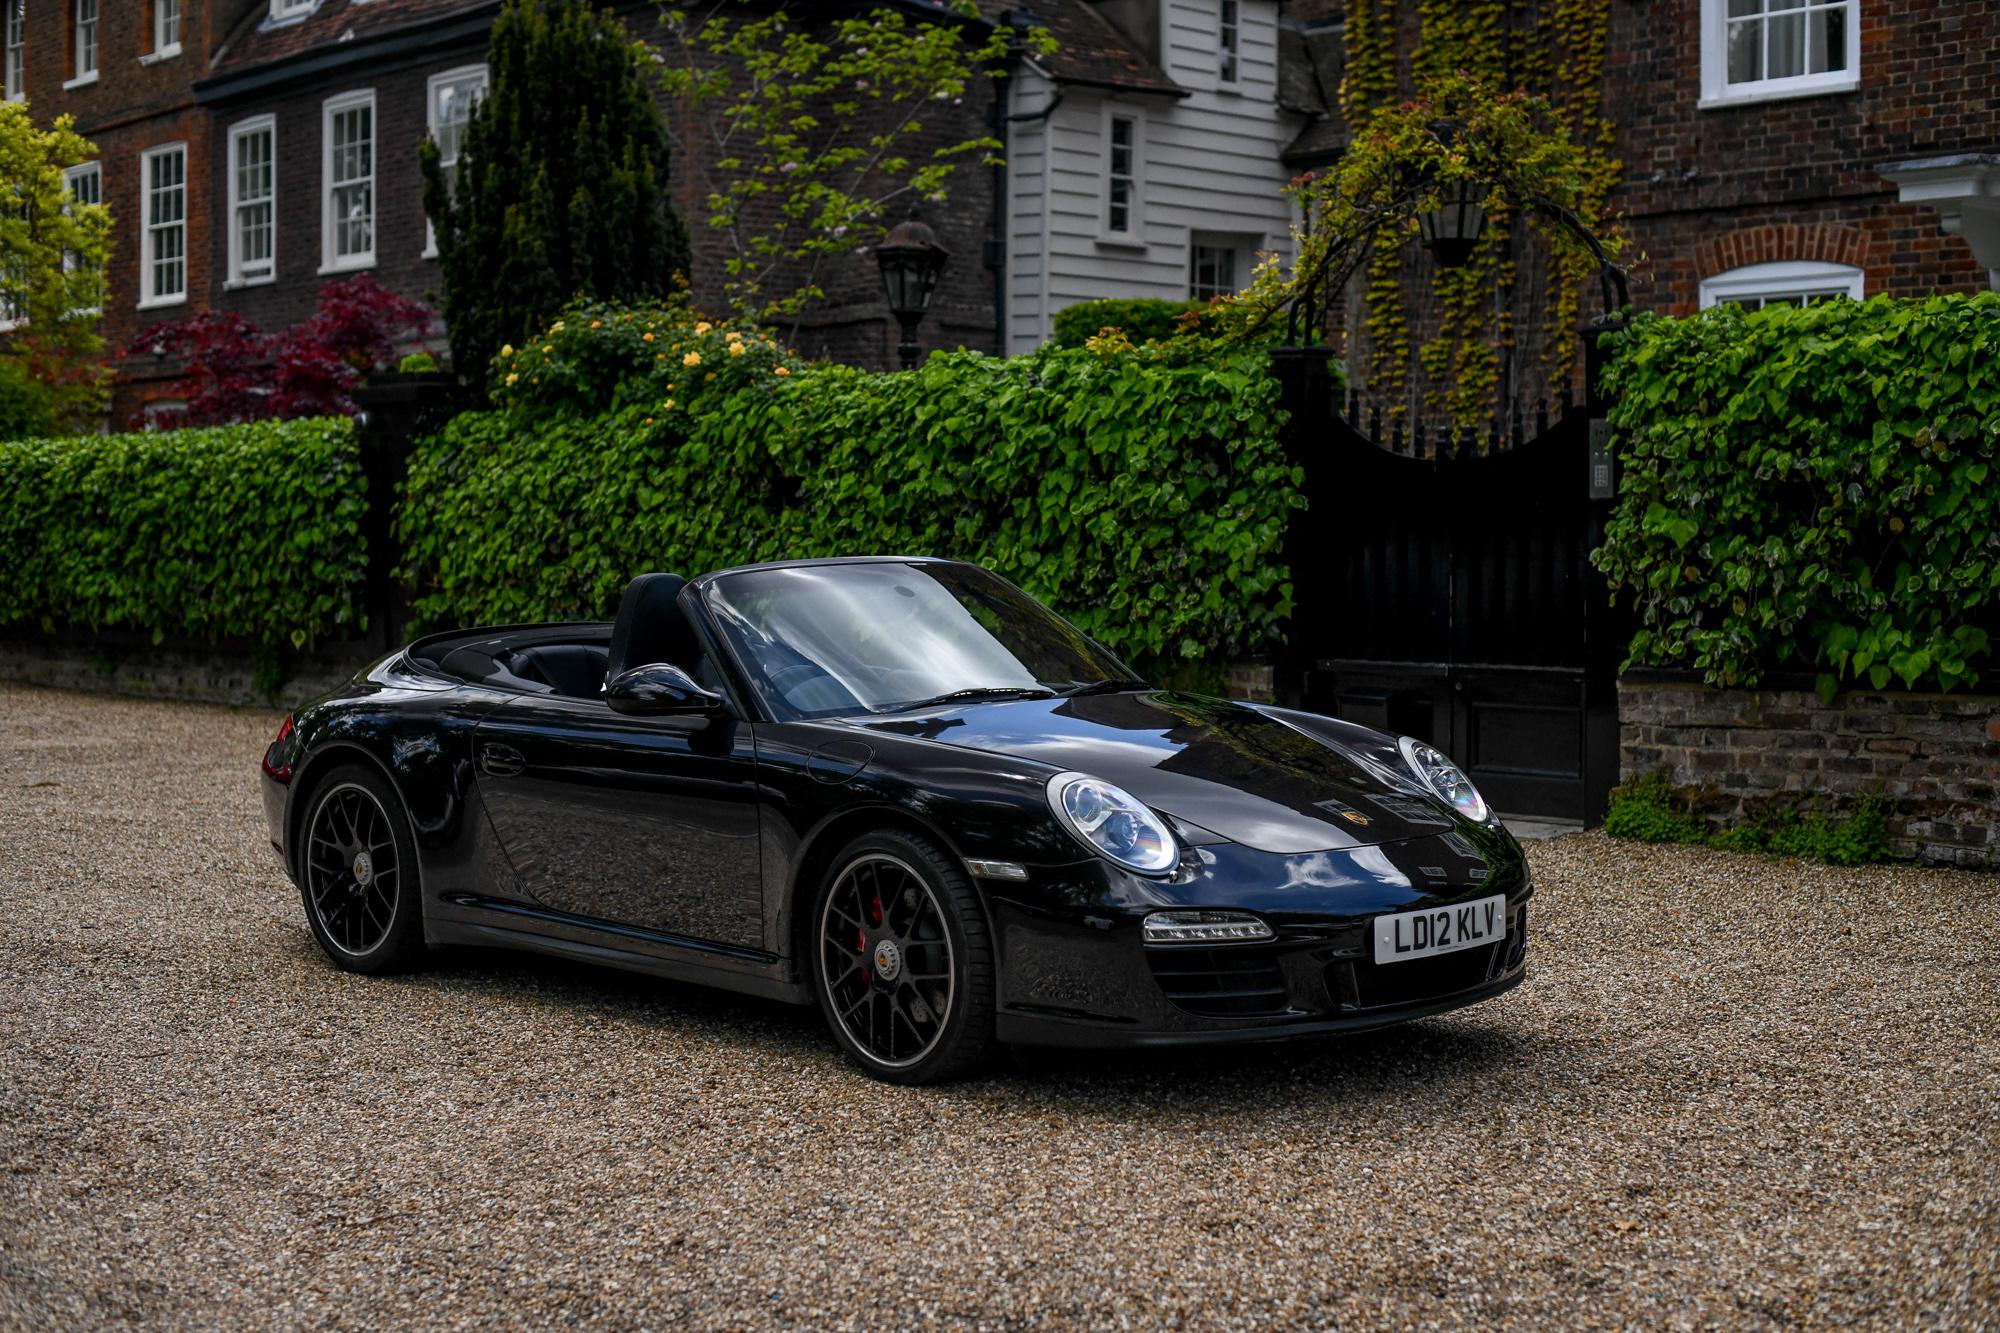 Porsche 997.2 Carrera 4 GTS